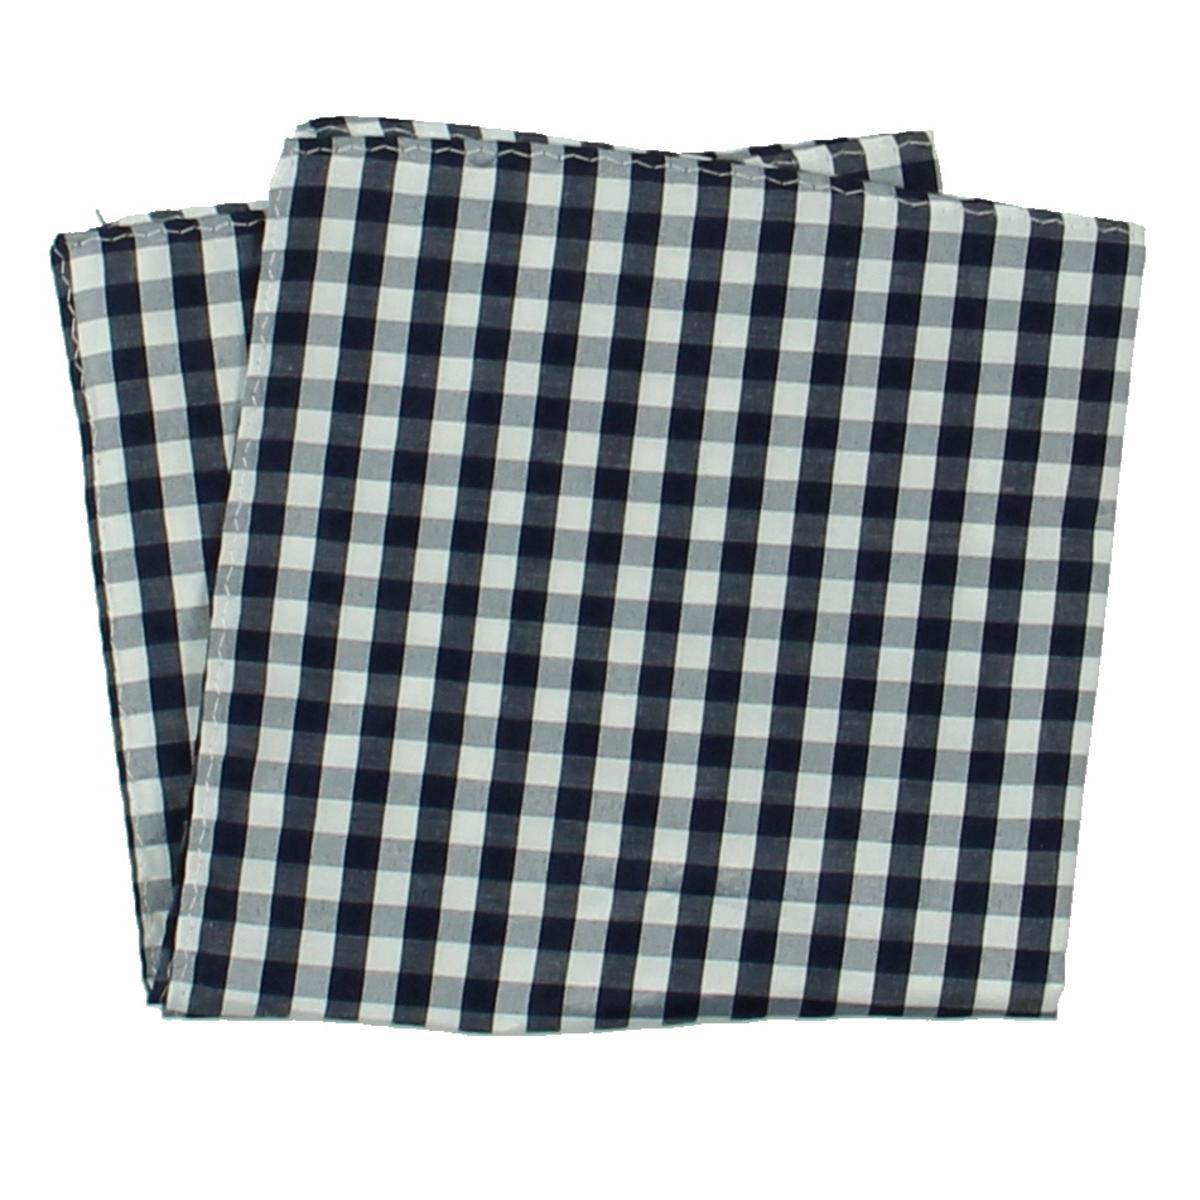 0cb8d2ac78 Details about Club Room Mens Navy Plaid Gingham Handkerchief Pocket Square  O S BHFO 3403